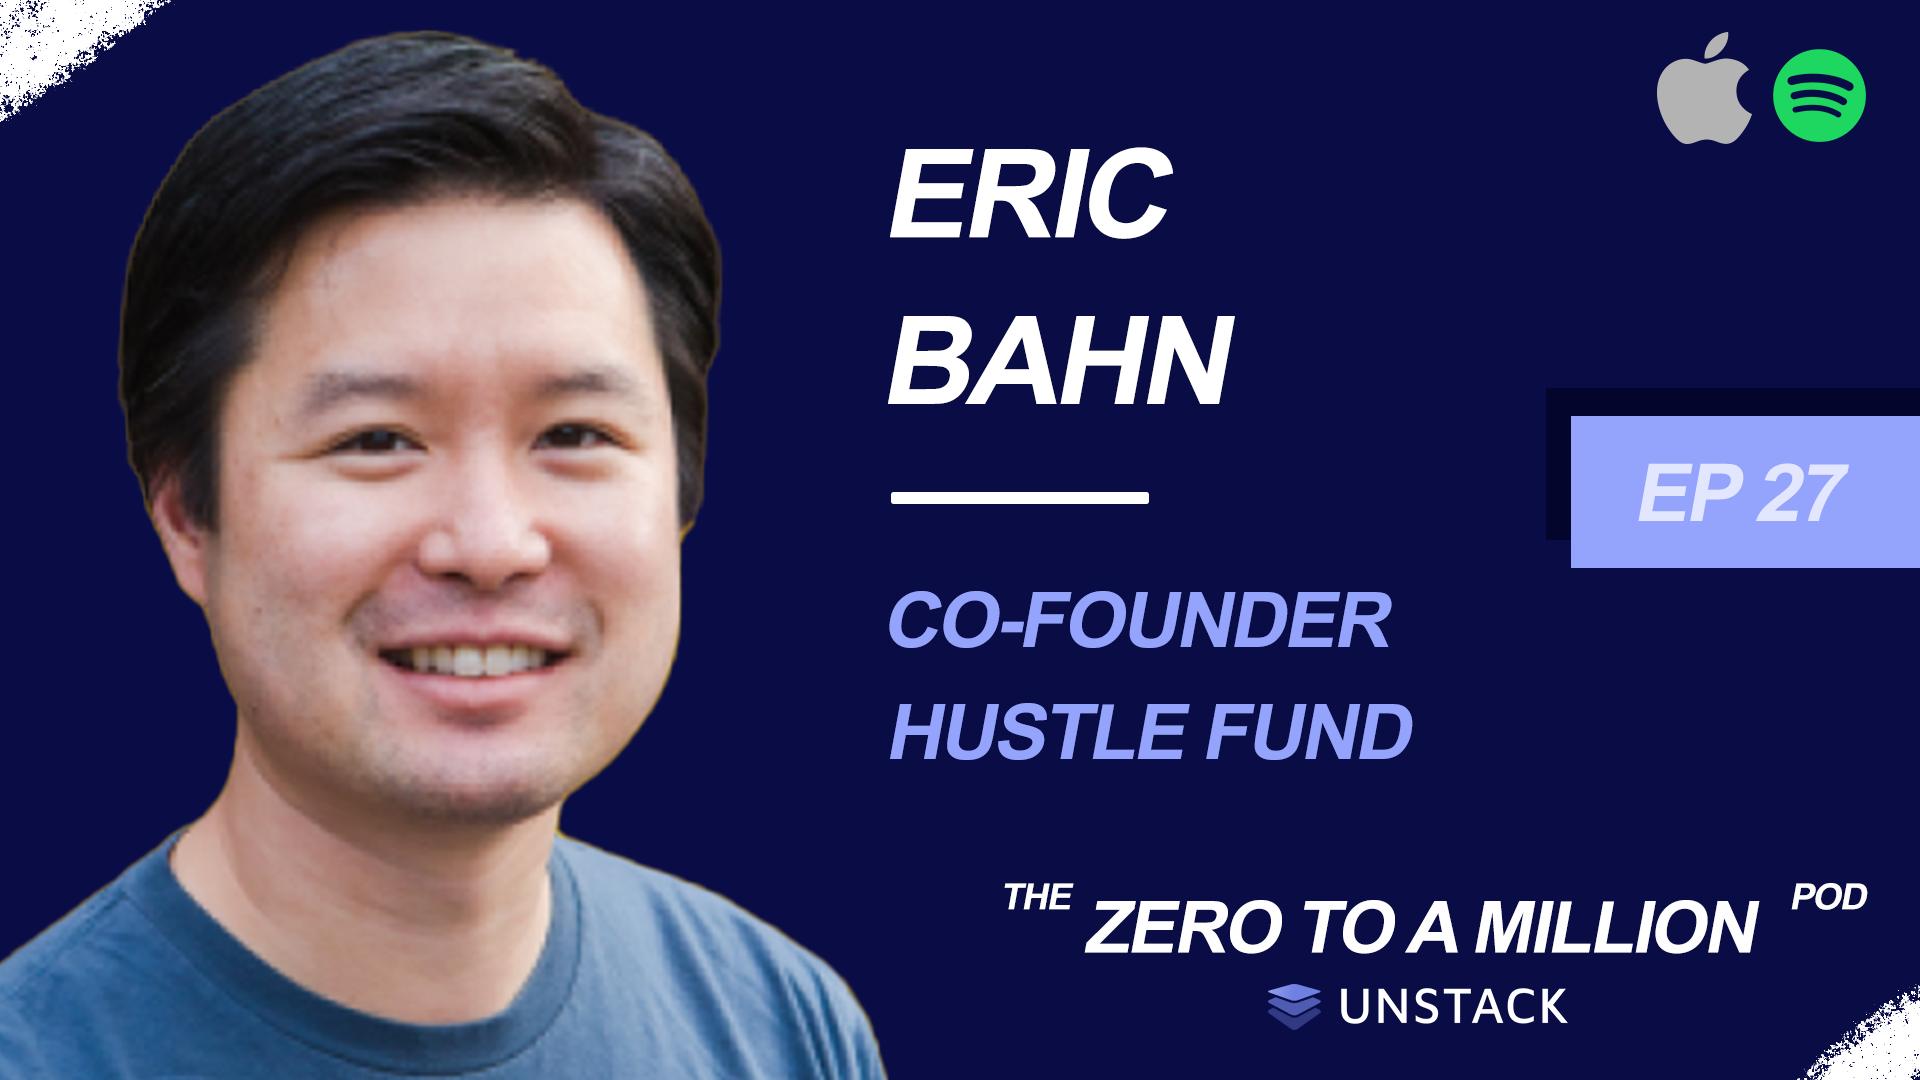 Zero to a Million, Episode 27: Eric Bahn, Hustle Fund